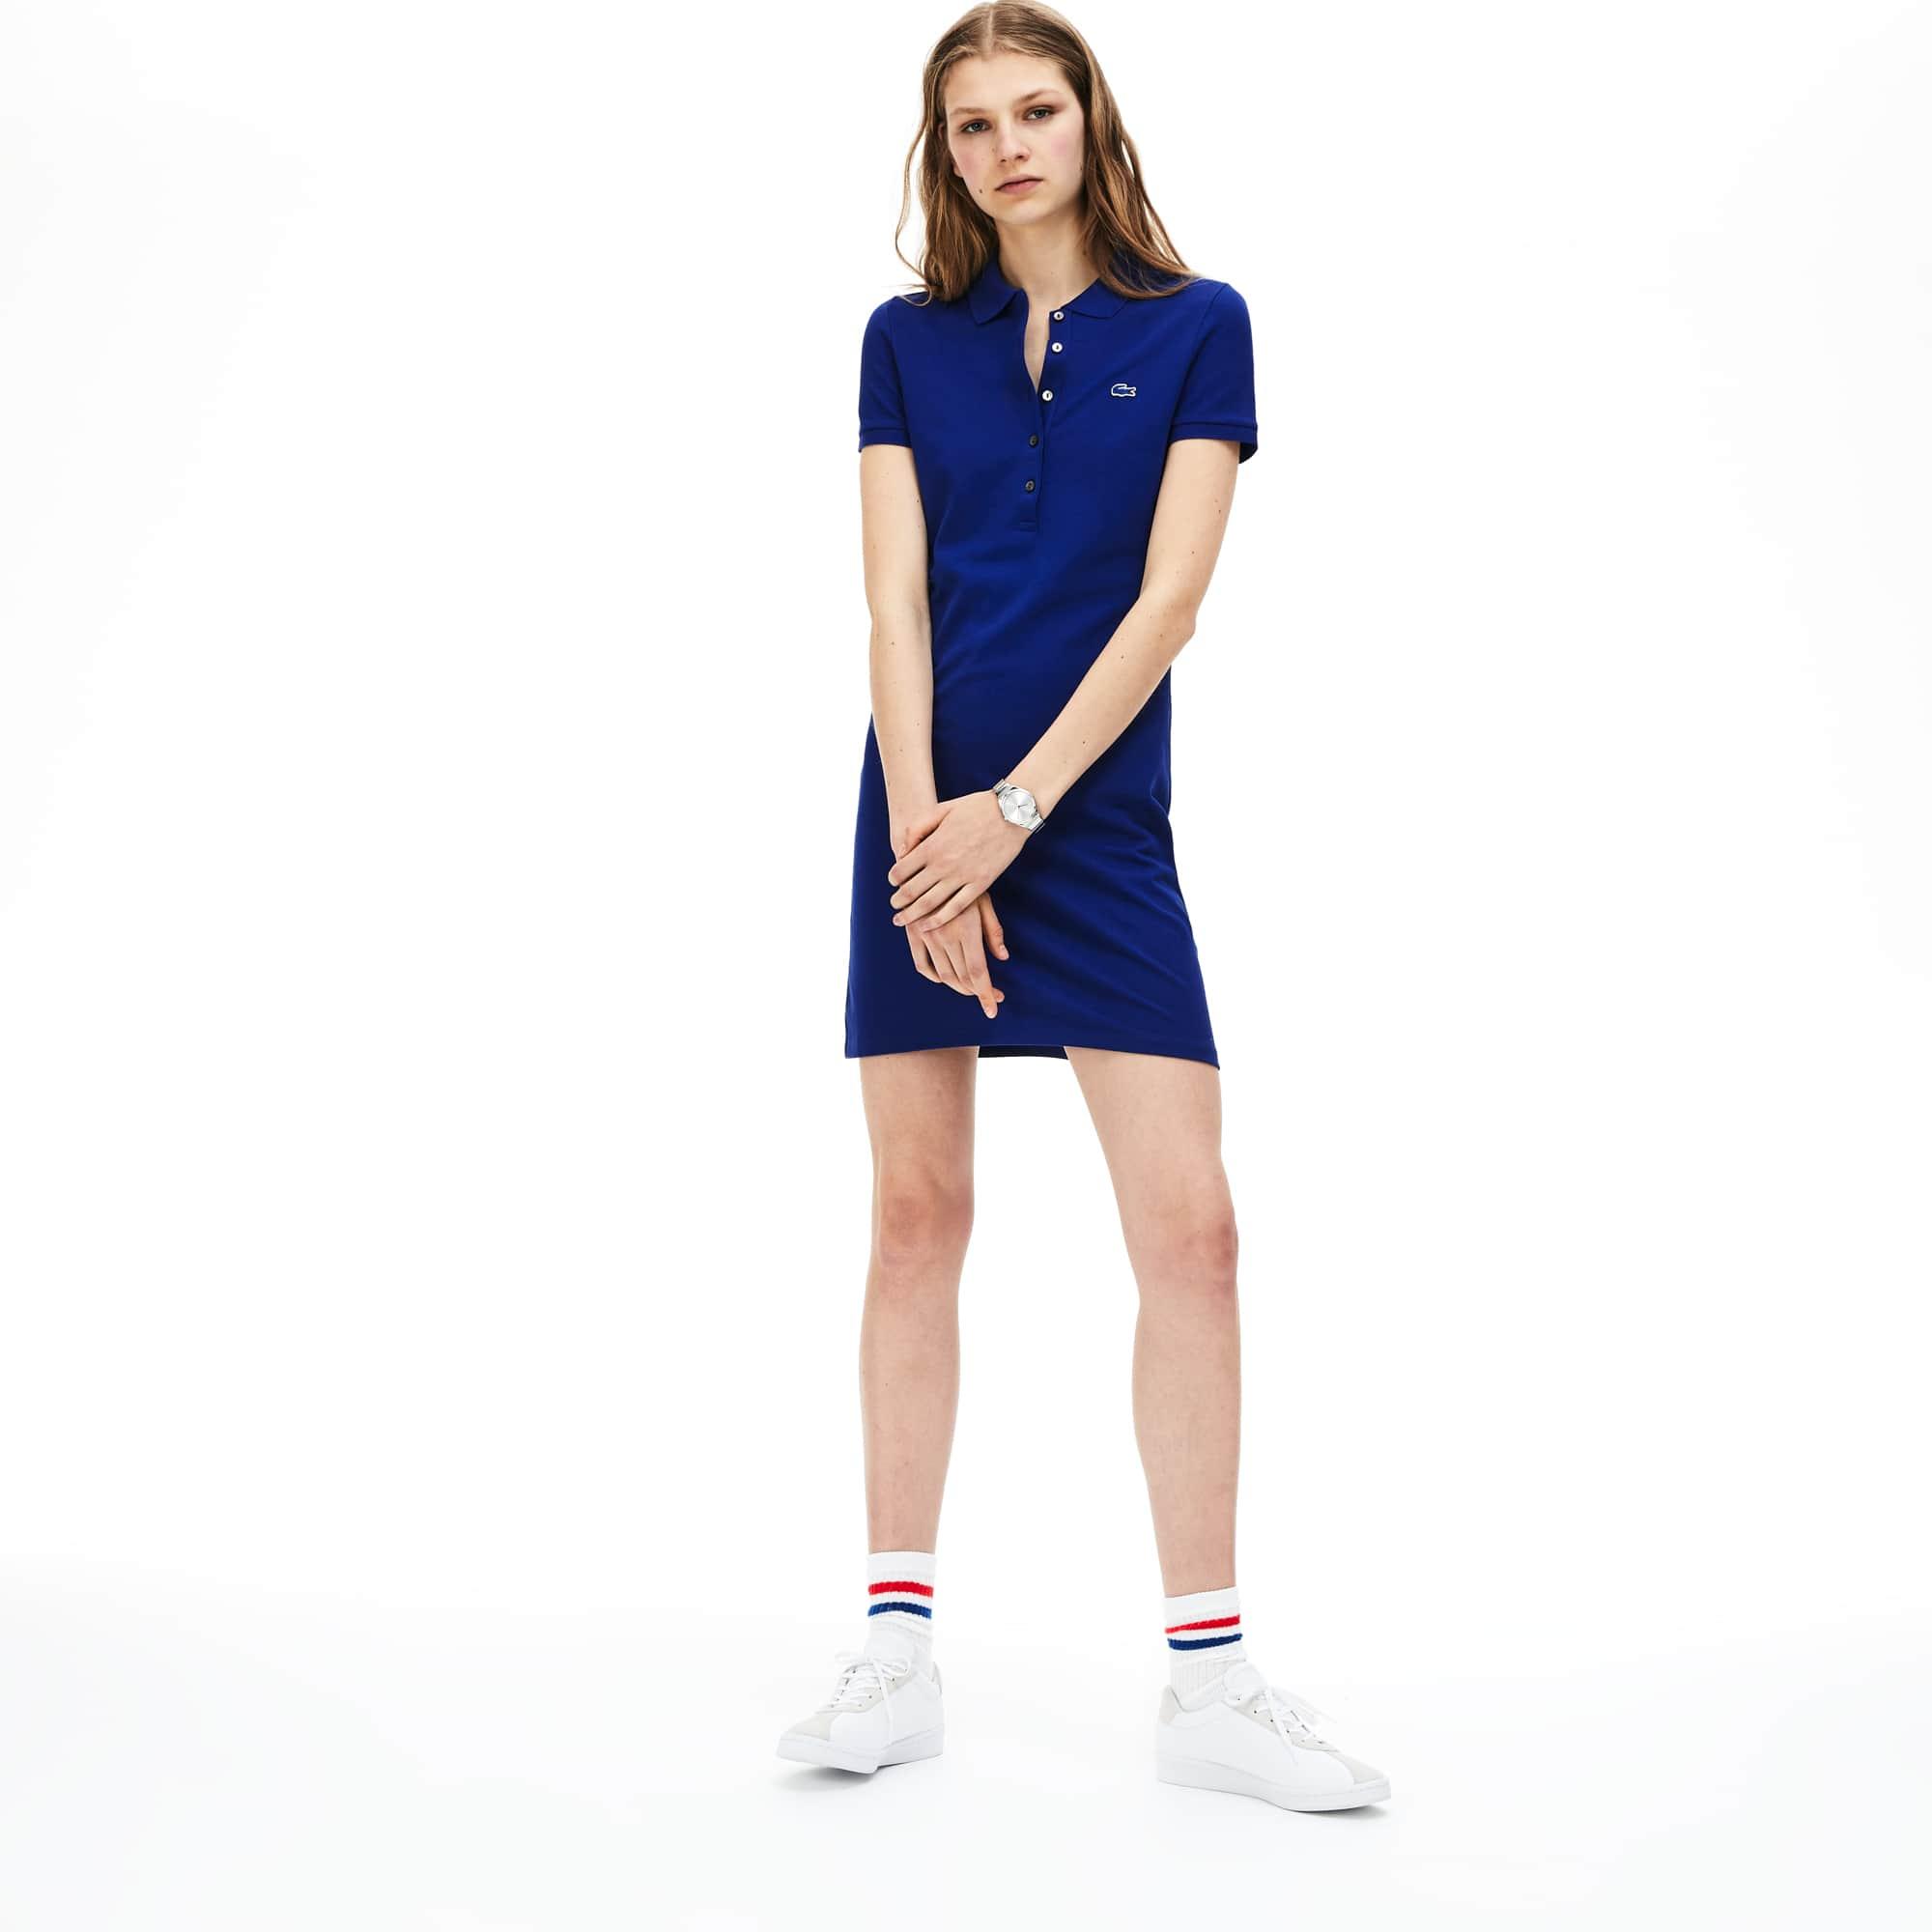 7f03609fd Dresses & Skirts | Women's Fashion | LACOSTE